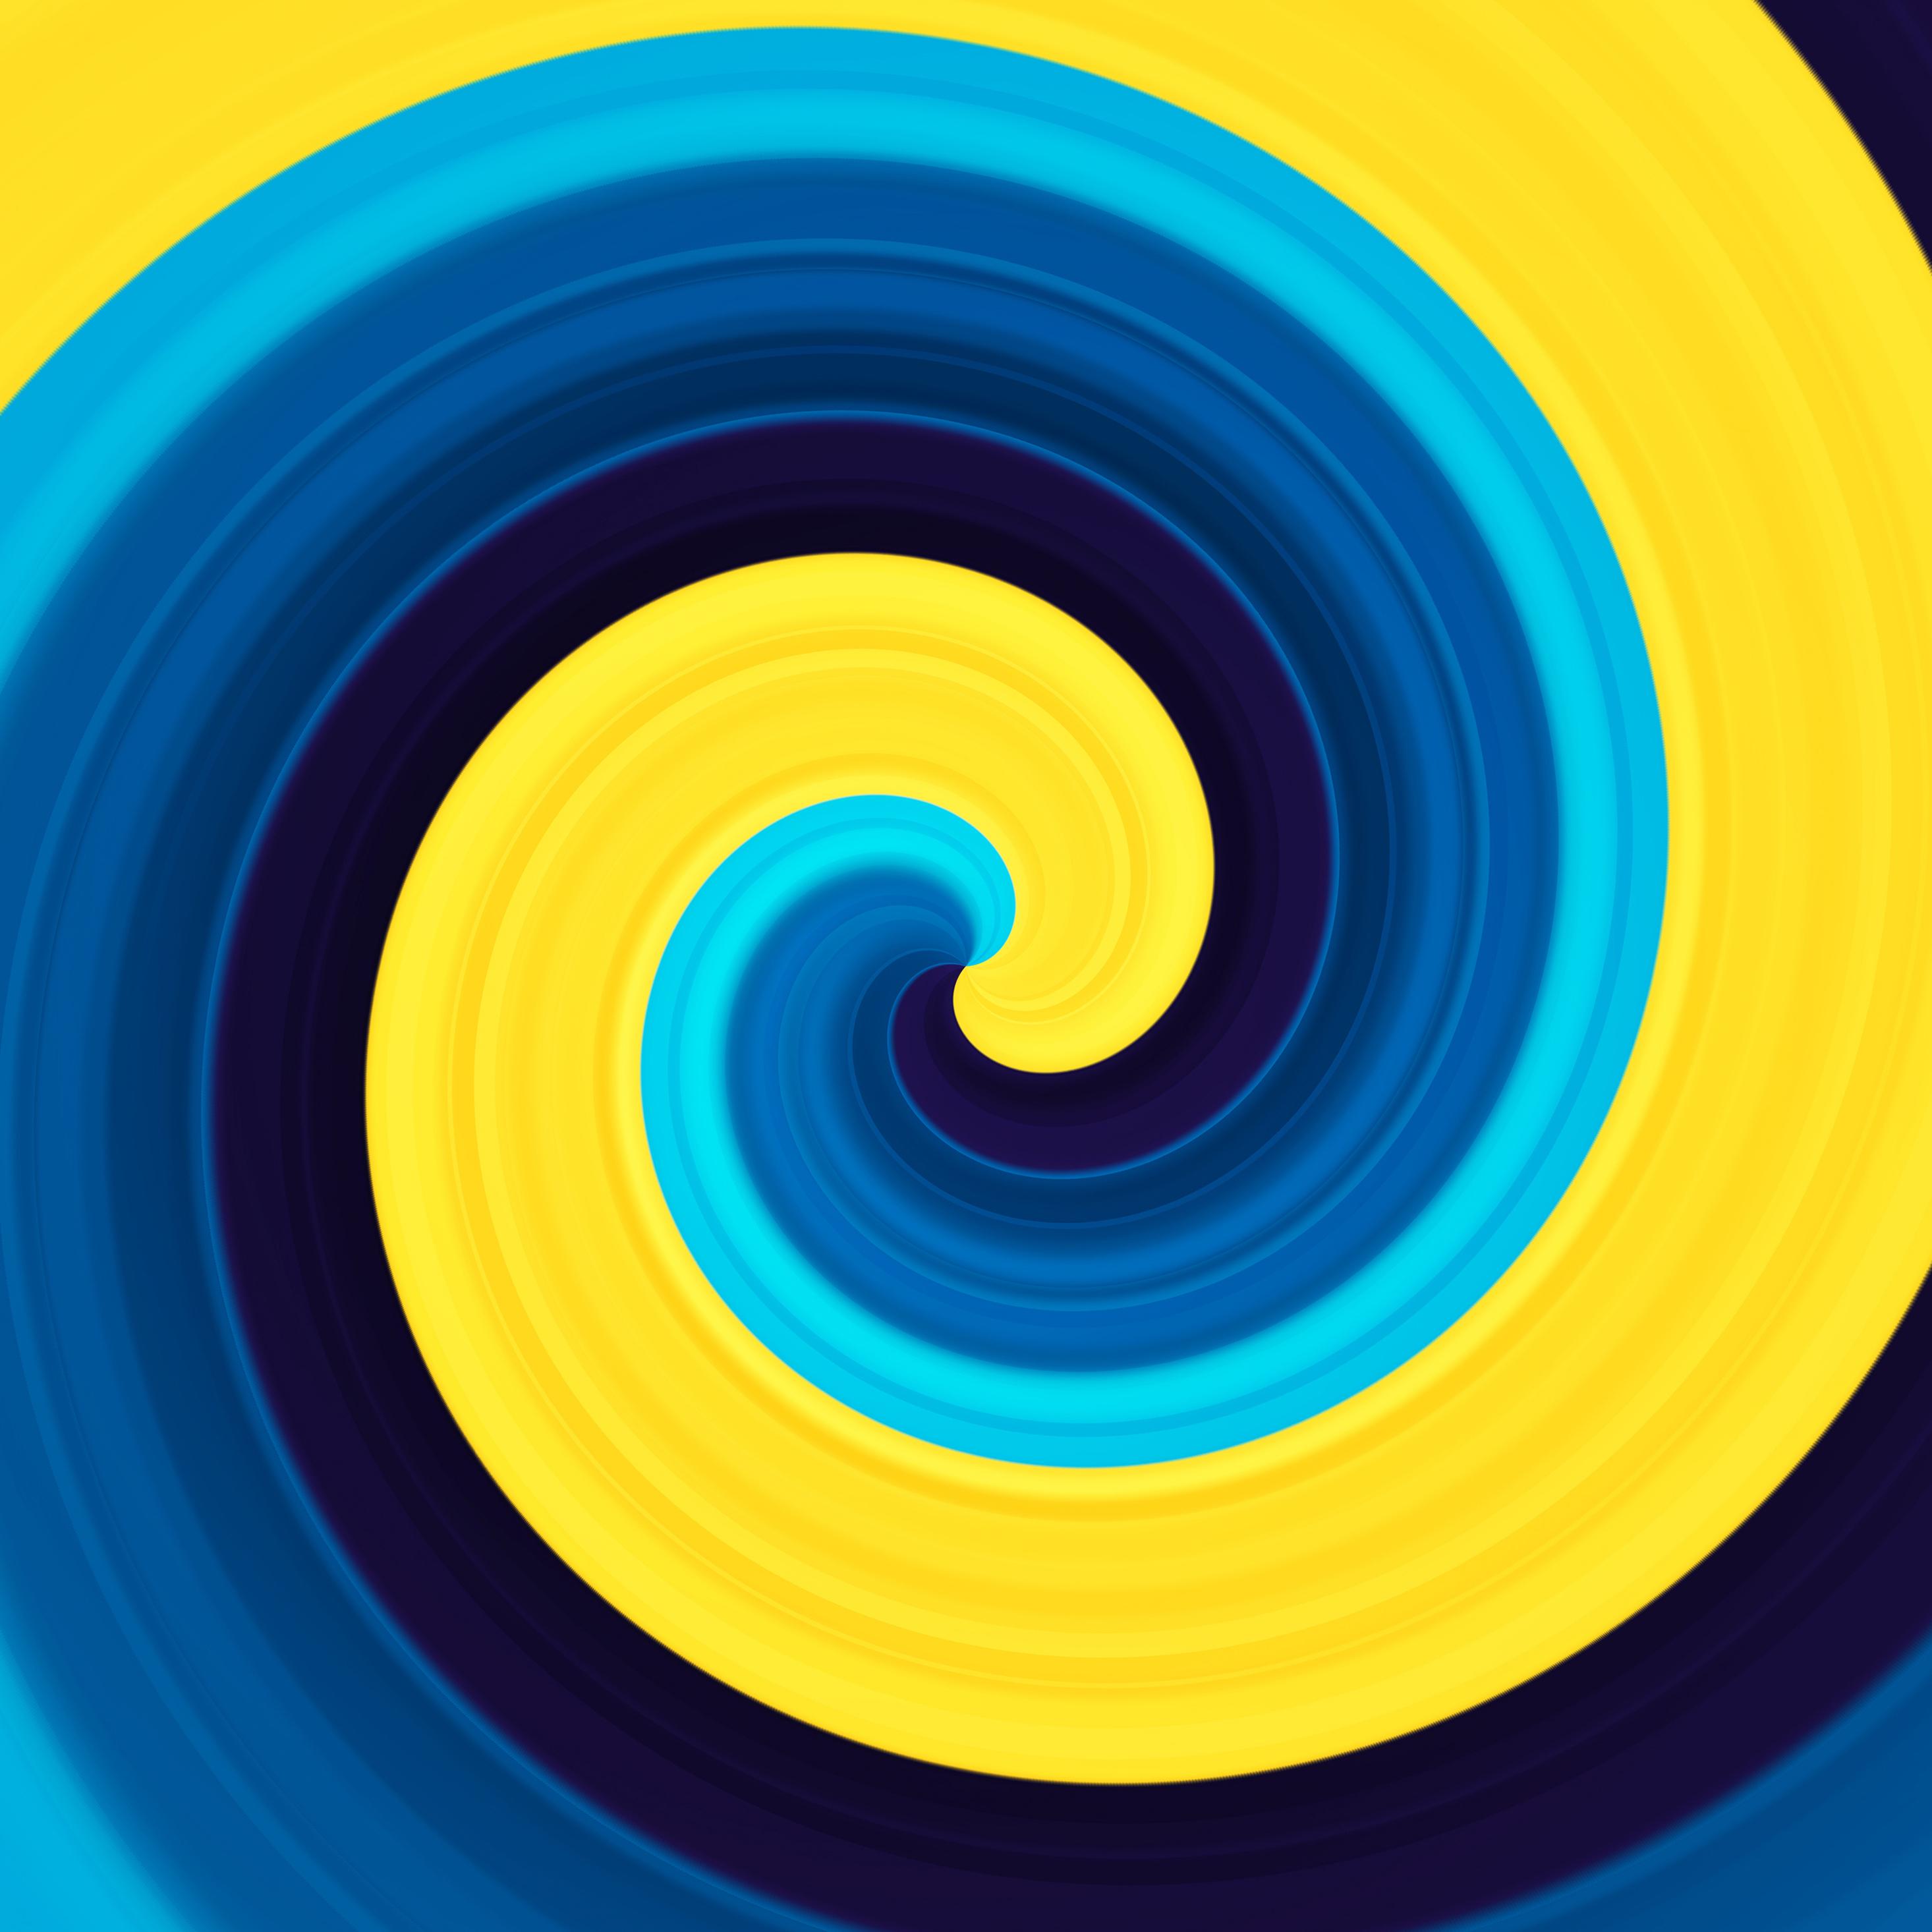 3d-abstract-swirl-yellow-blue-5k-50.jpg